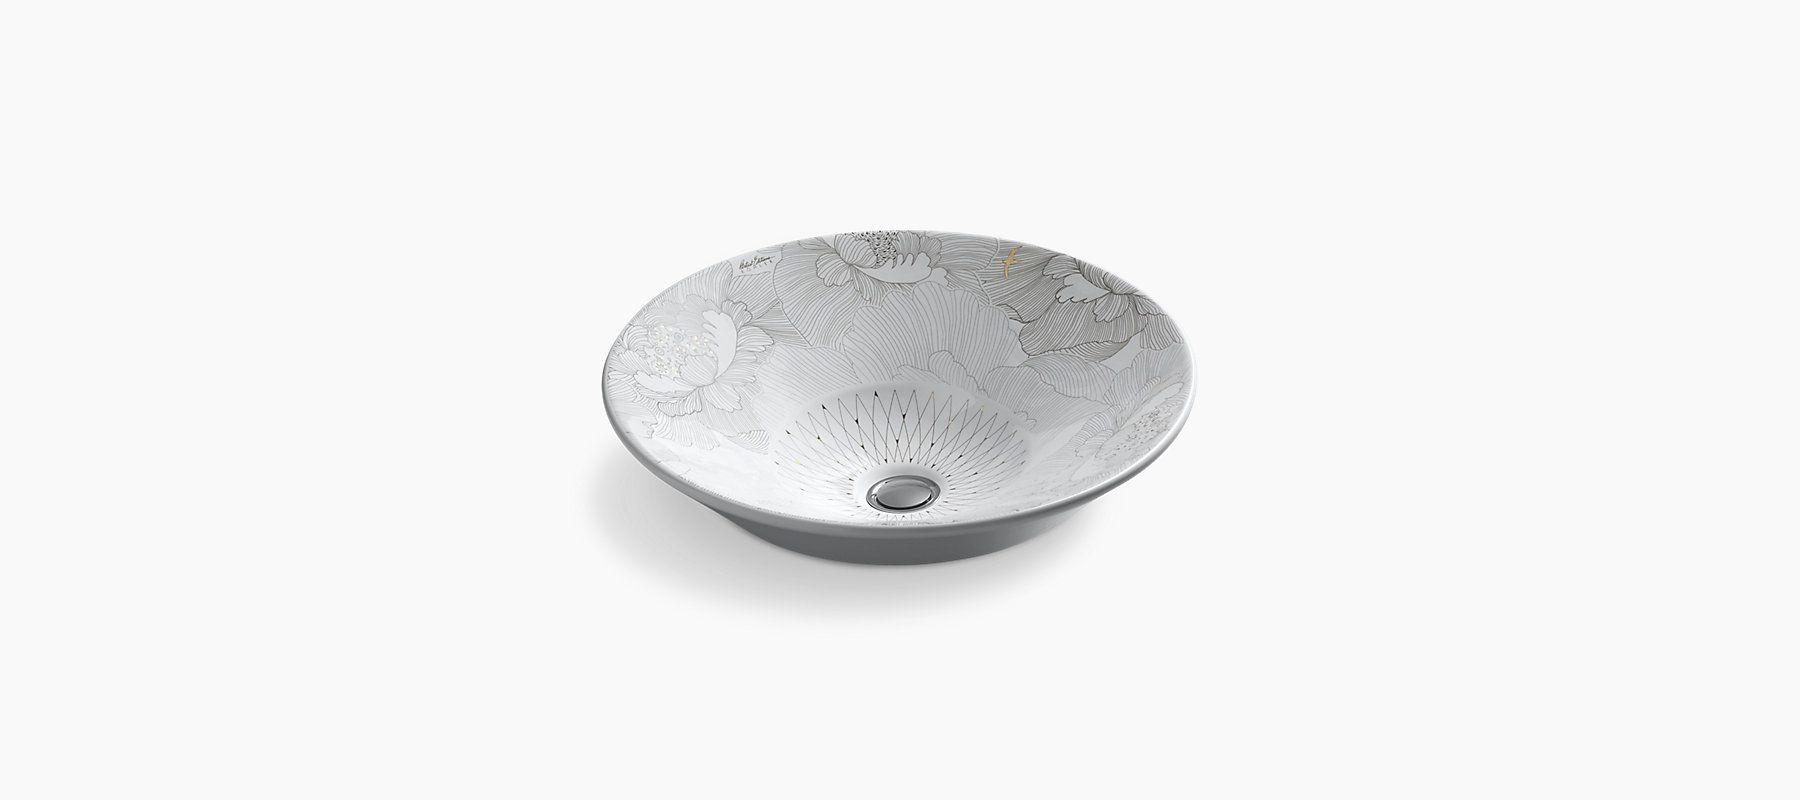 K-14223-SMC | Empress Bouquet Design on Conical Bell Countertop Sink | KOHLER